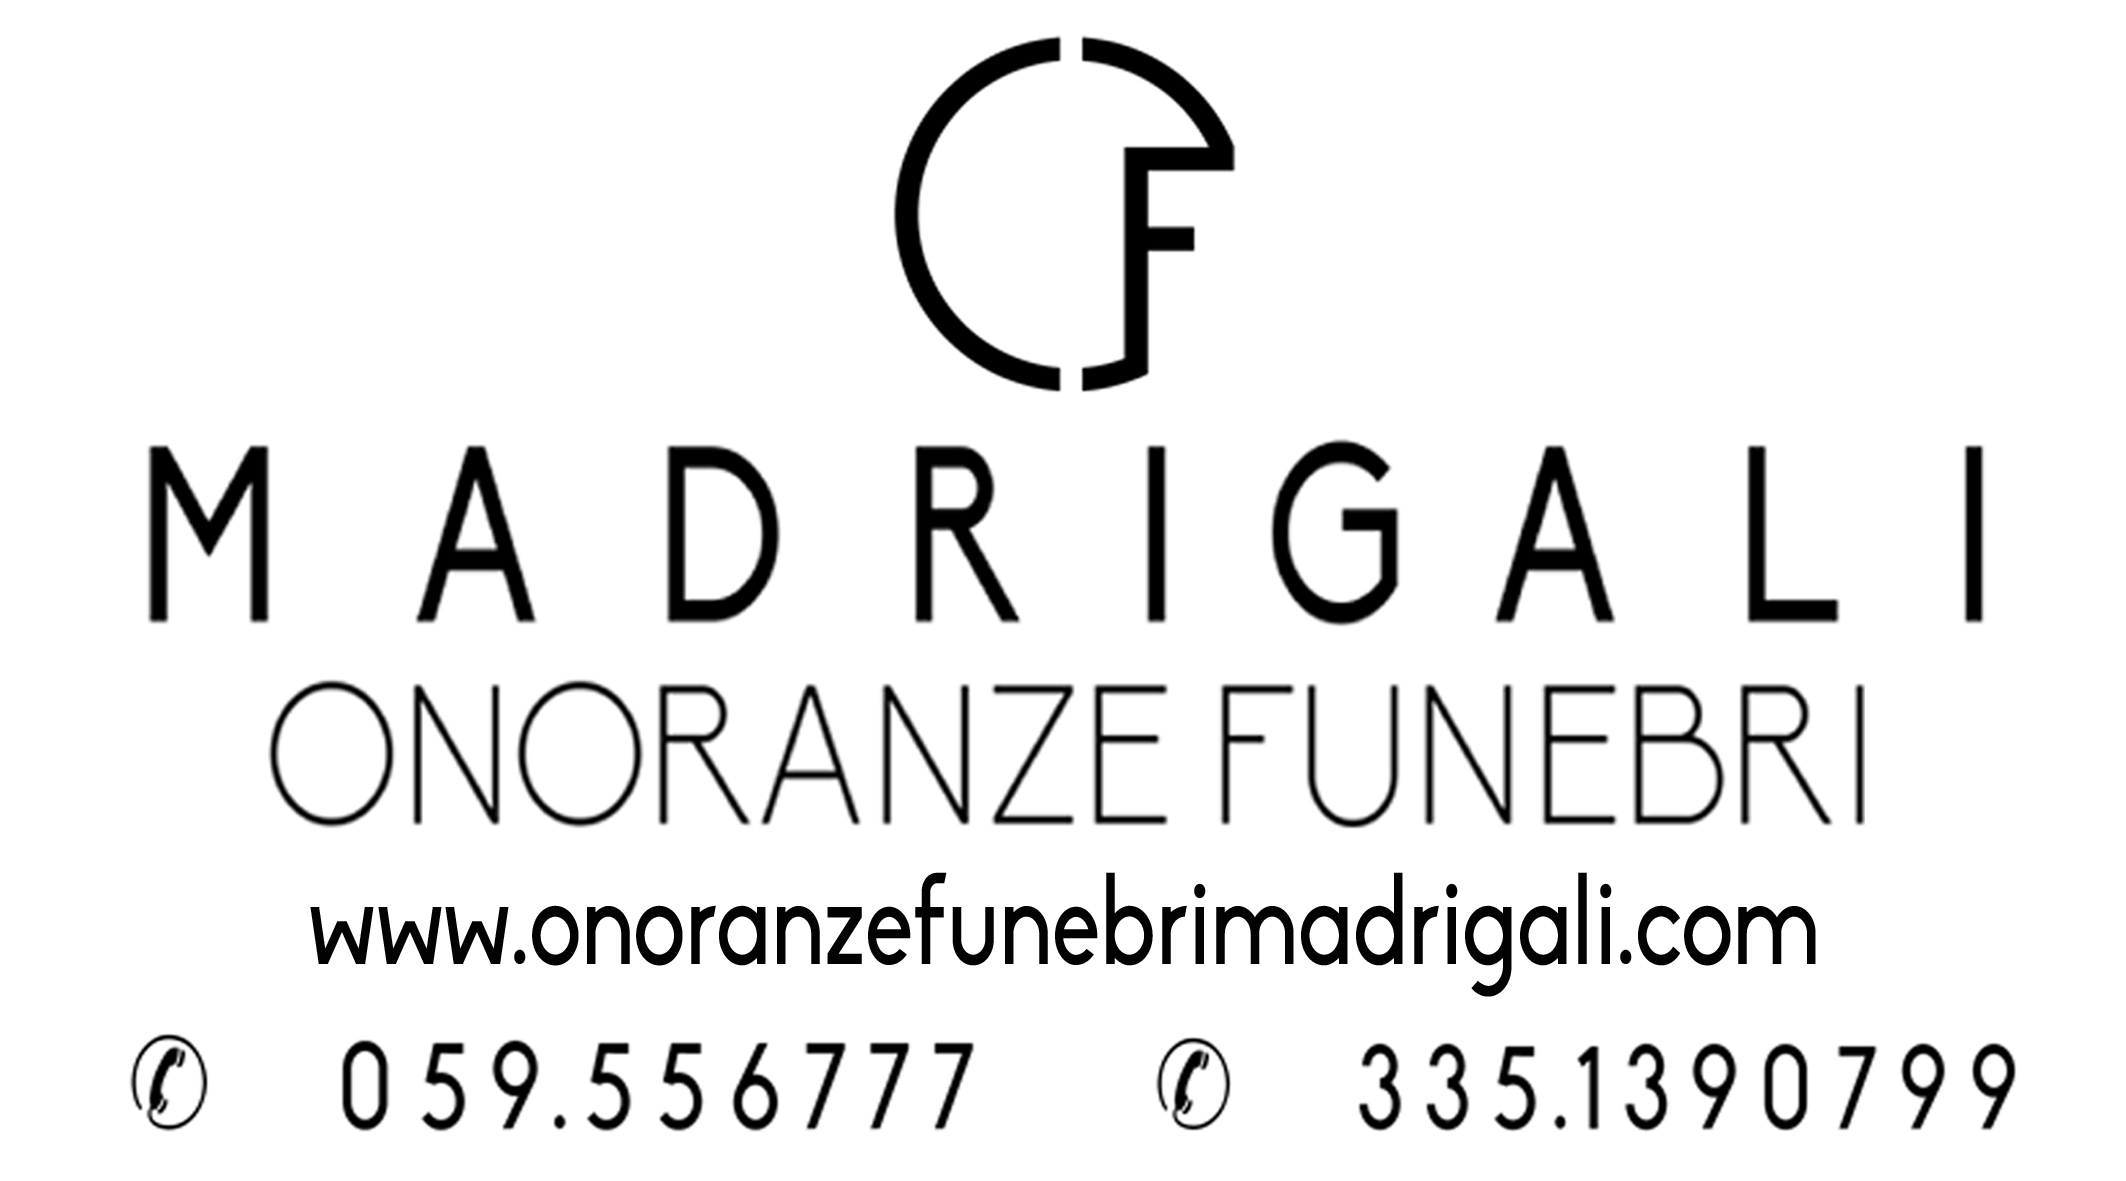 Agenzia Onoranze Funebri Madrigali